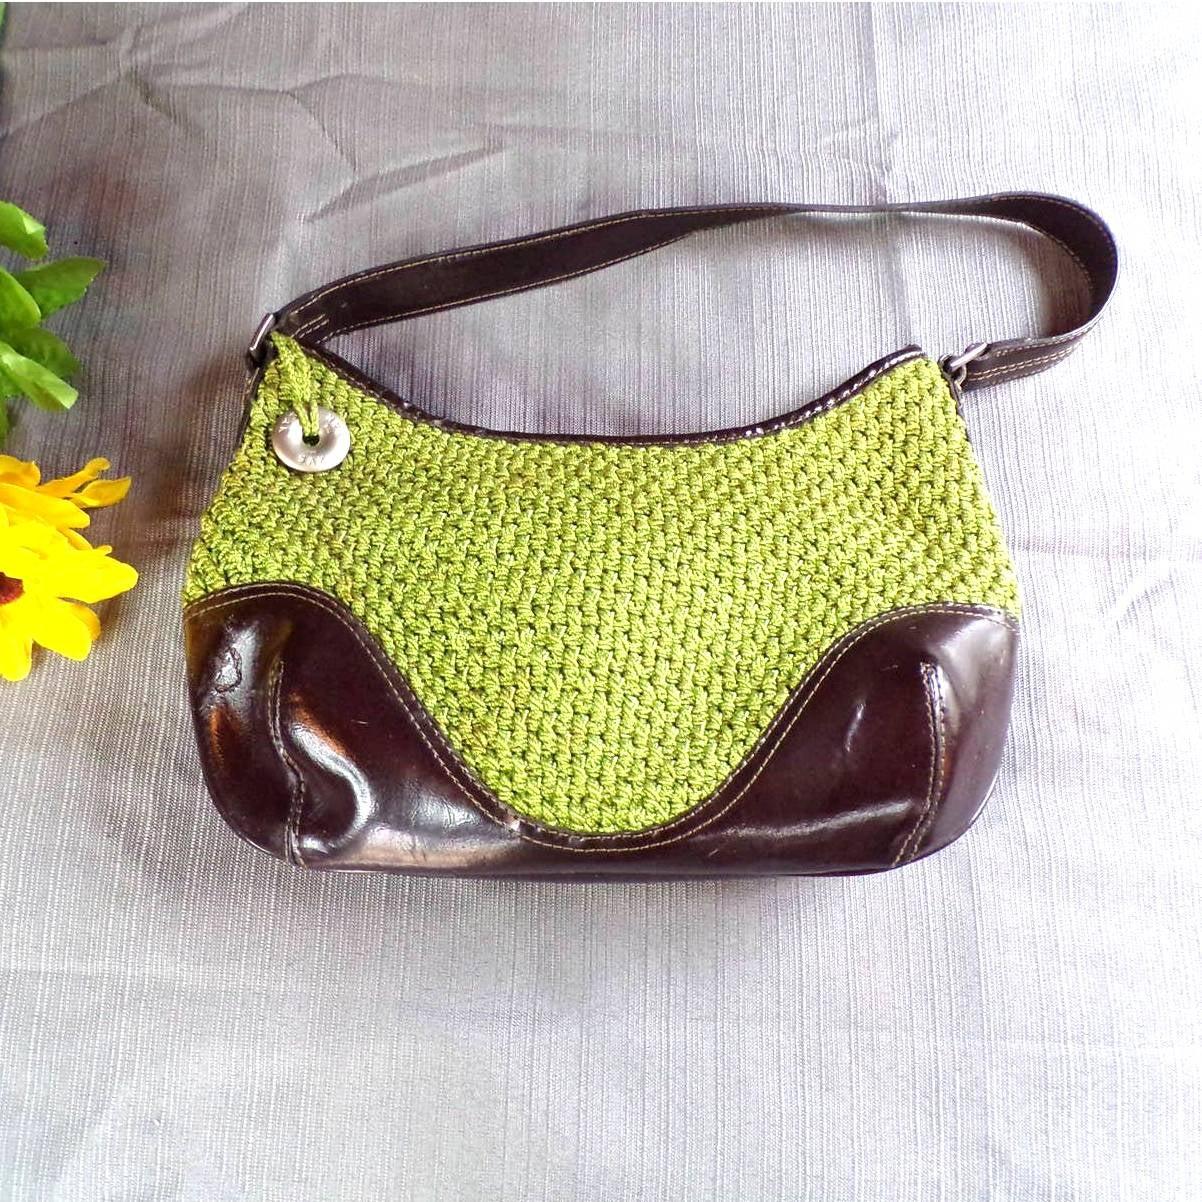 The Sak Handbag Knitted Fabric & Leather